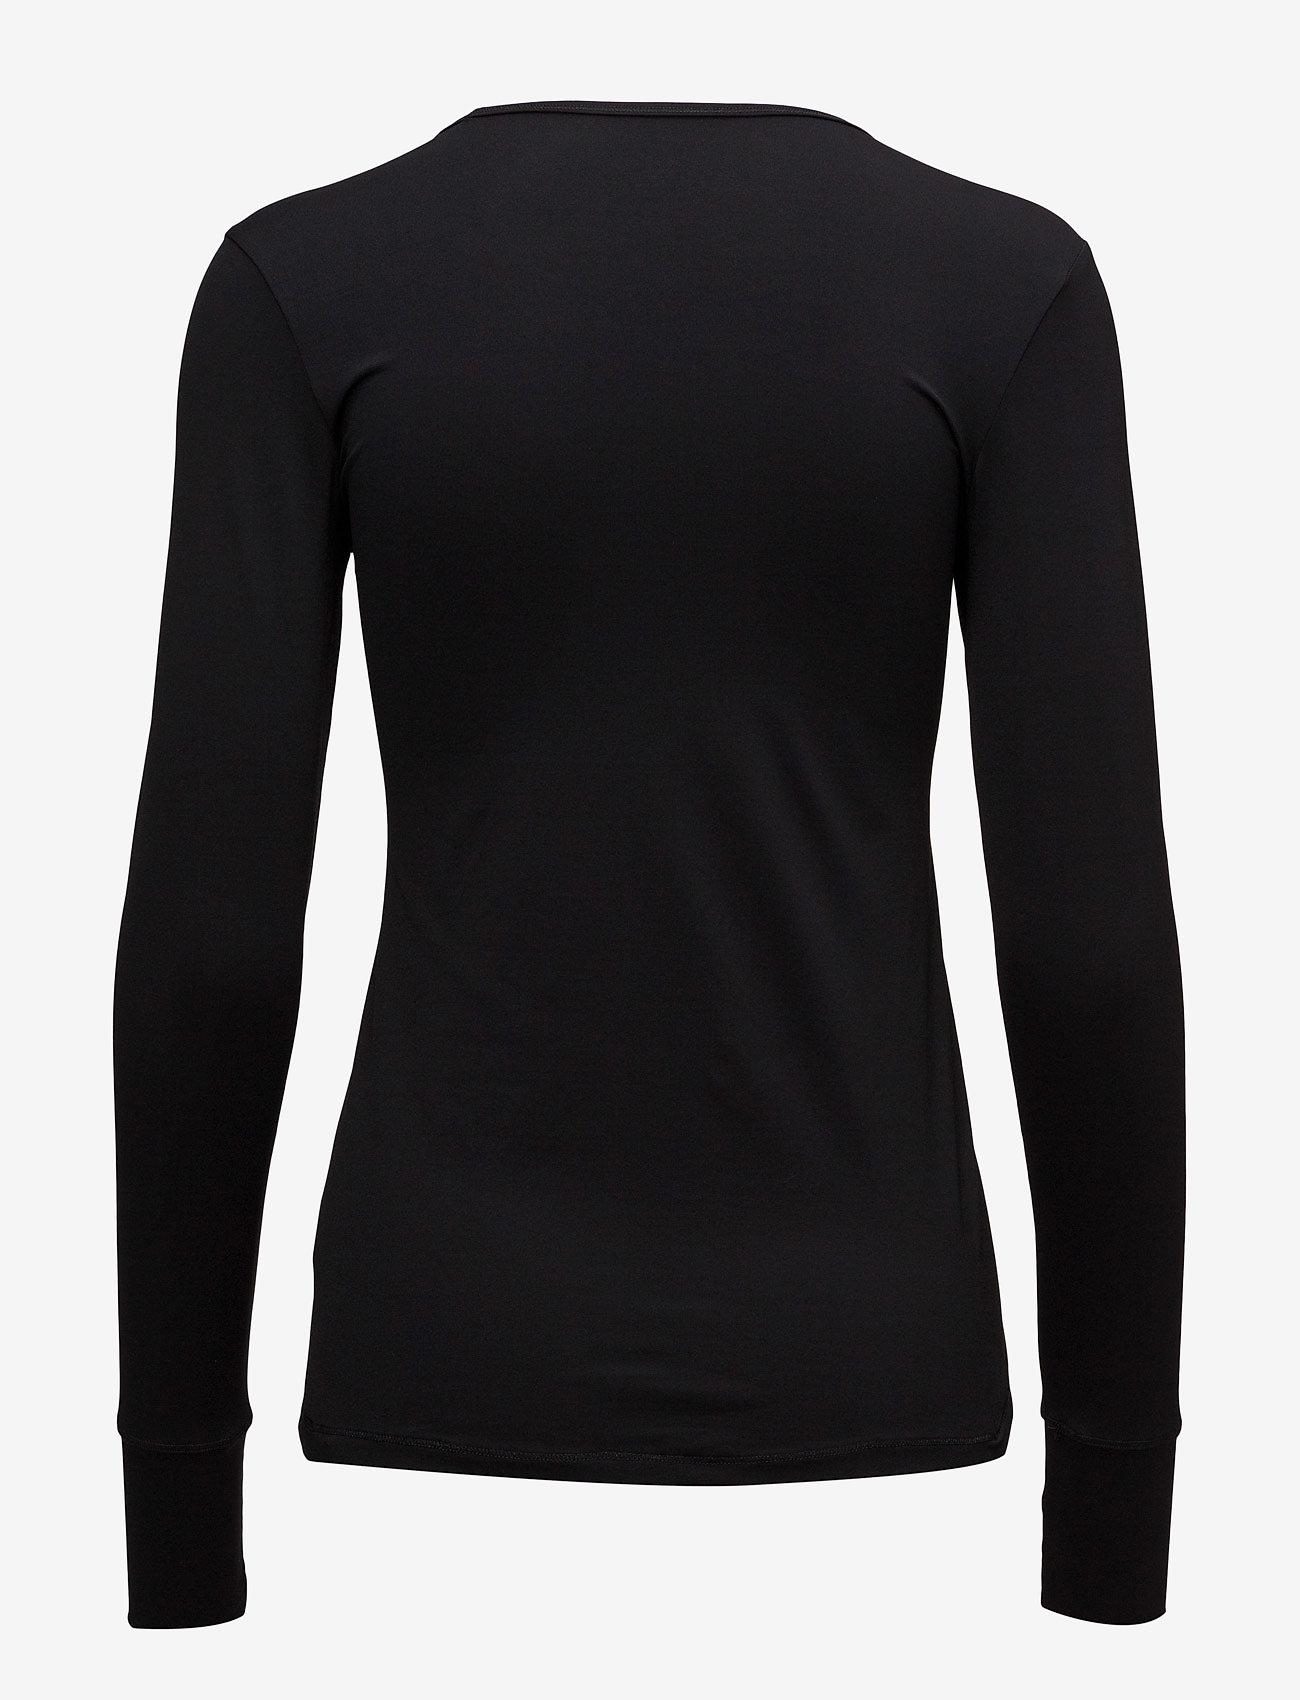 Casall - Essential long sleeve - bluzki z długim rękawem - black - 1